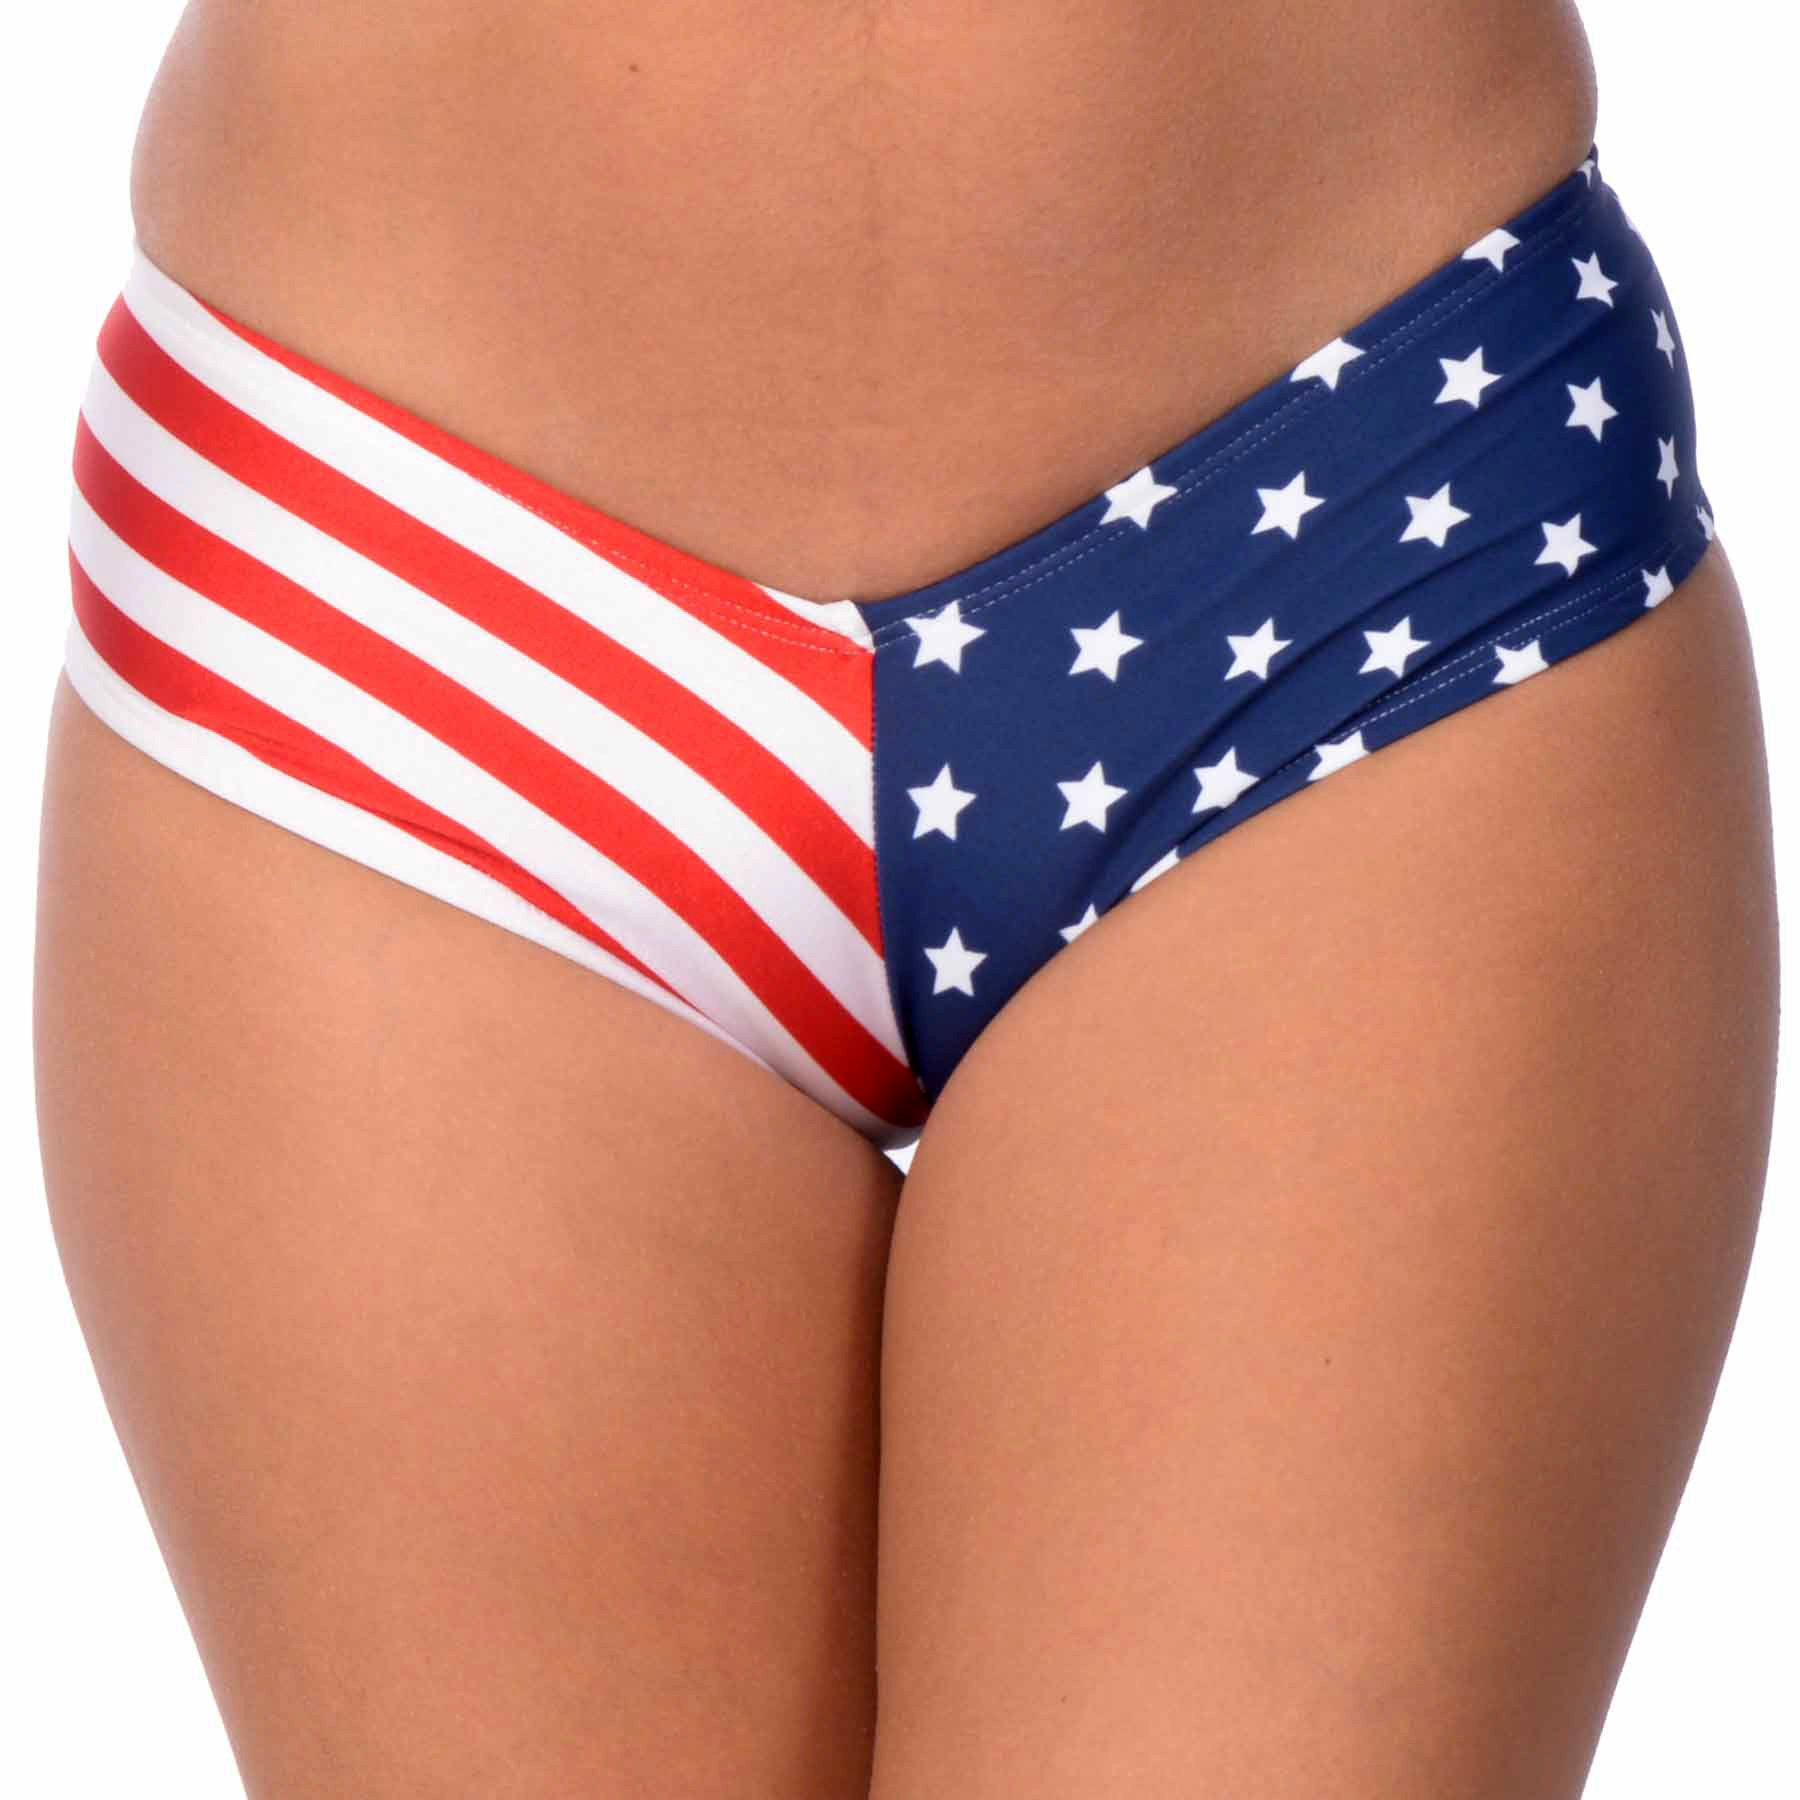 Women's Brazilian V-Style Swimuit USA Stars & Stripes Bikini Bottom (Medium, USA) by Gary Majdell Sport (Image #1)